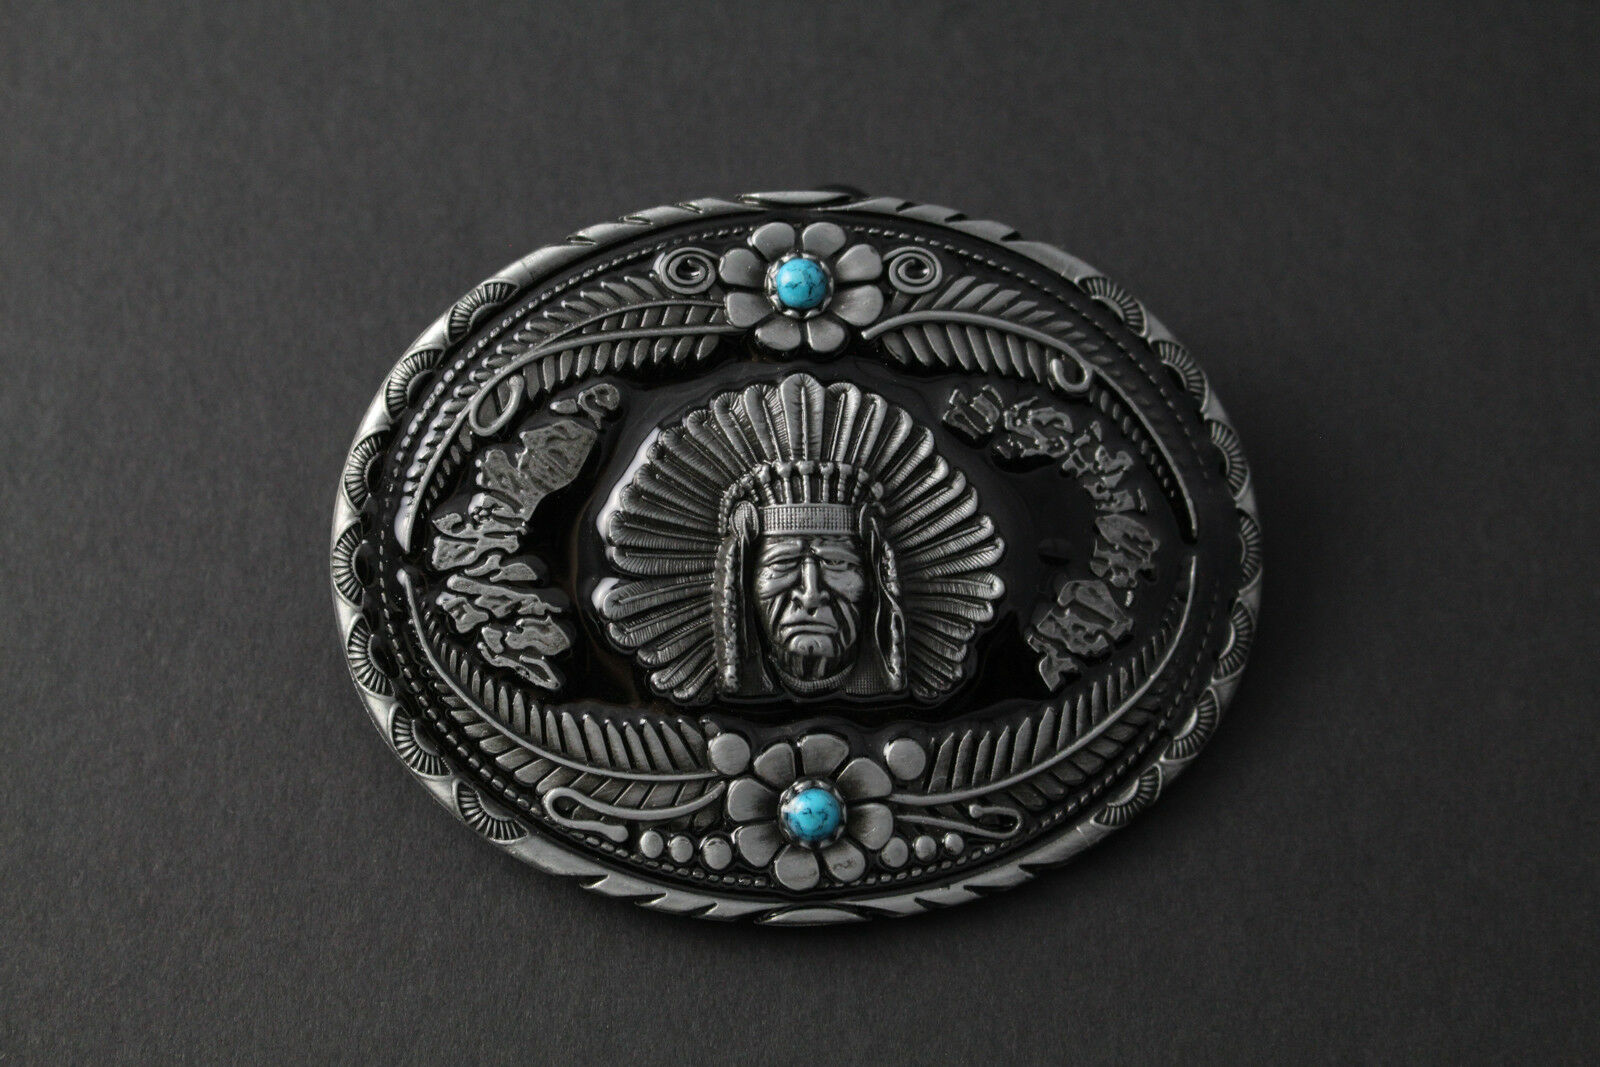 OVAL AMERICAN INDIAN FACE CHEROKEE BELT BUCKLE BLACK METAL FLORAL DETAIL